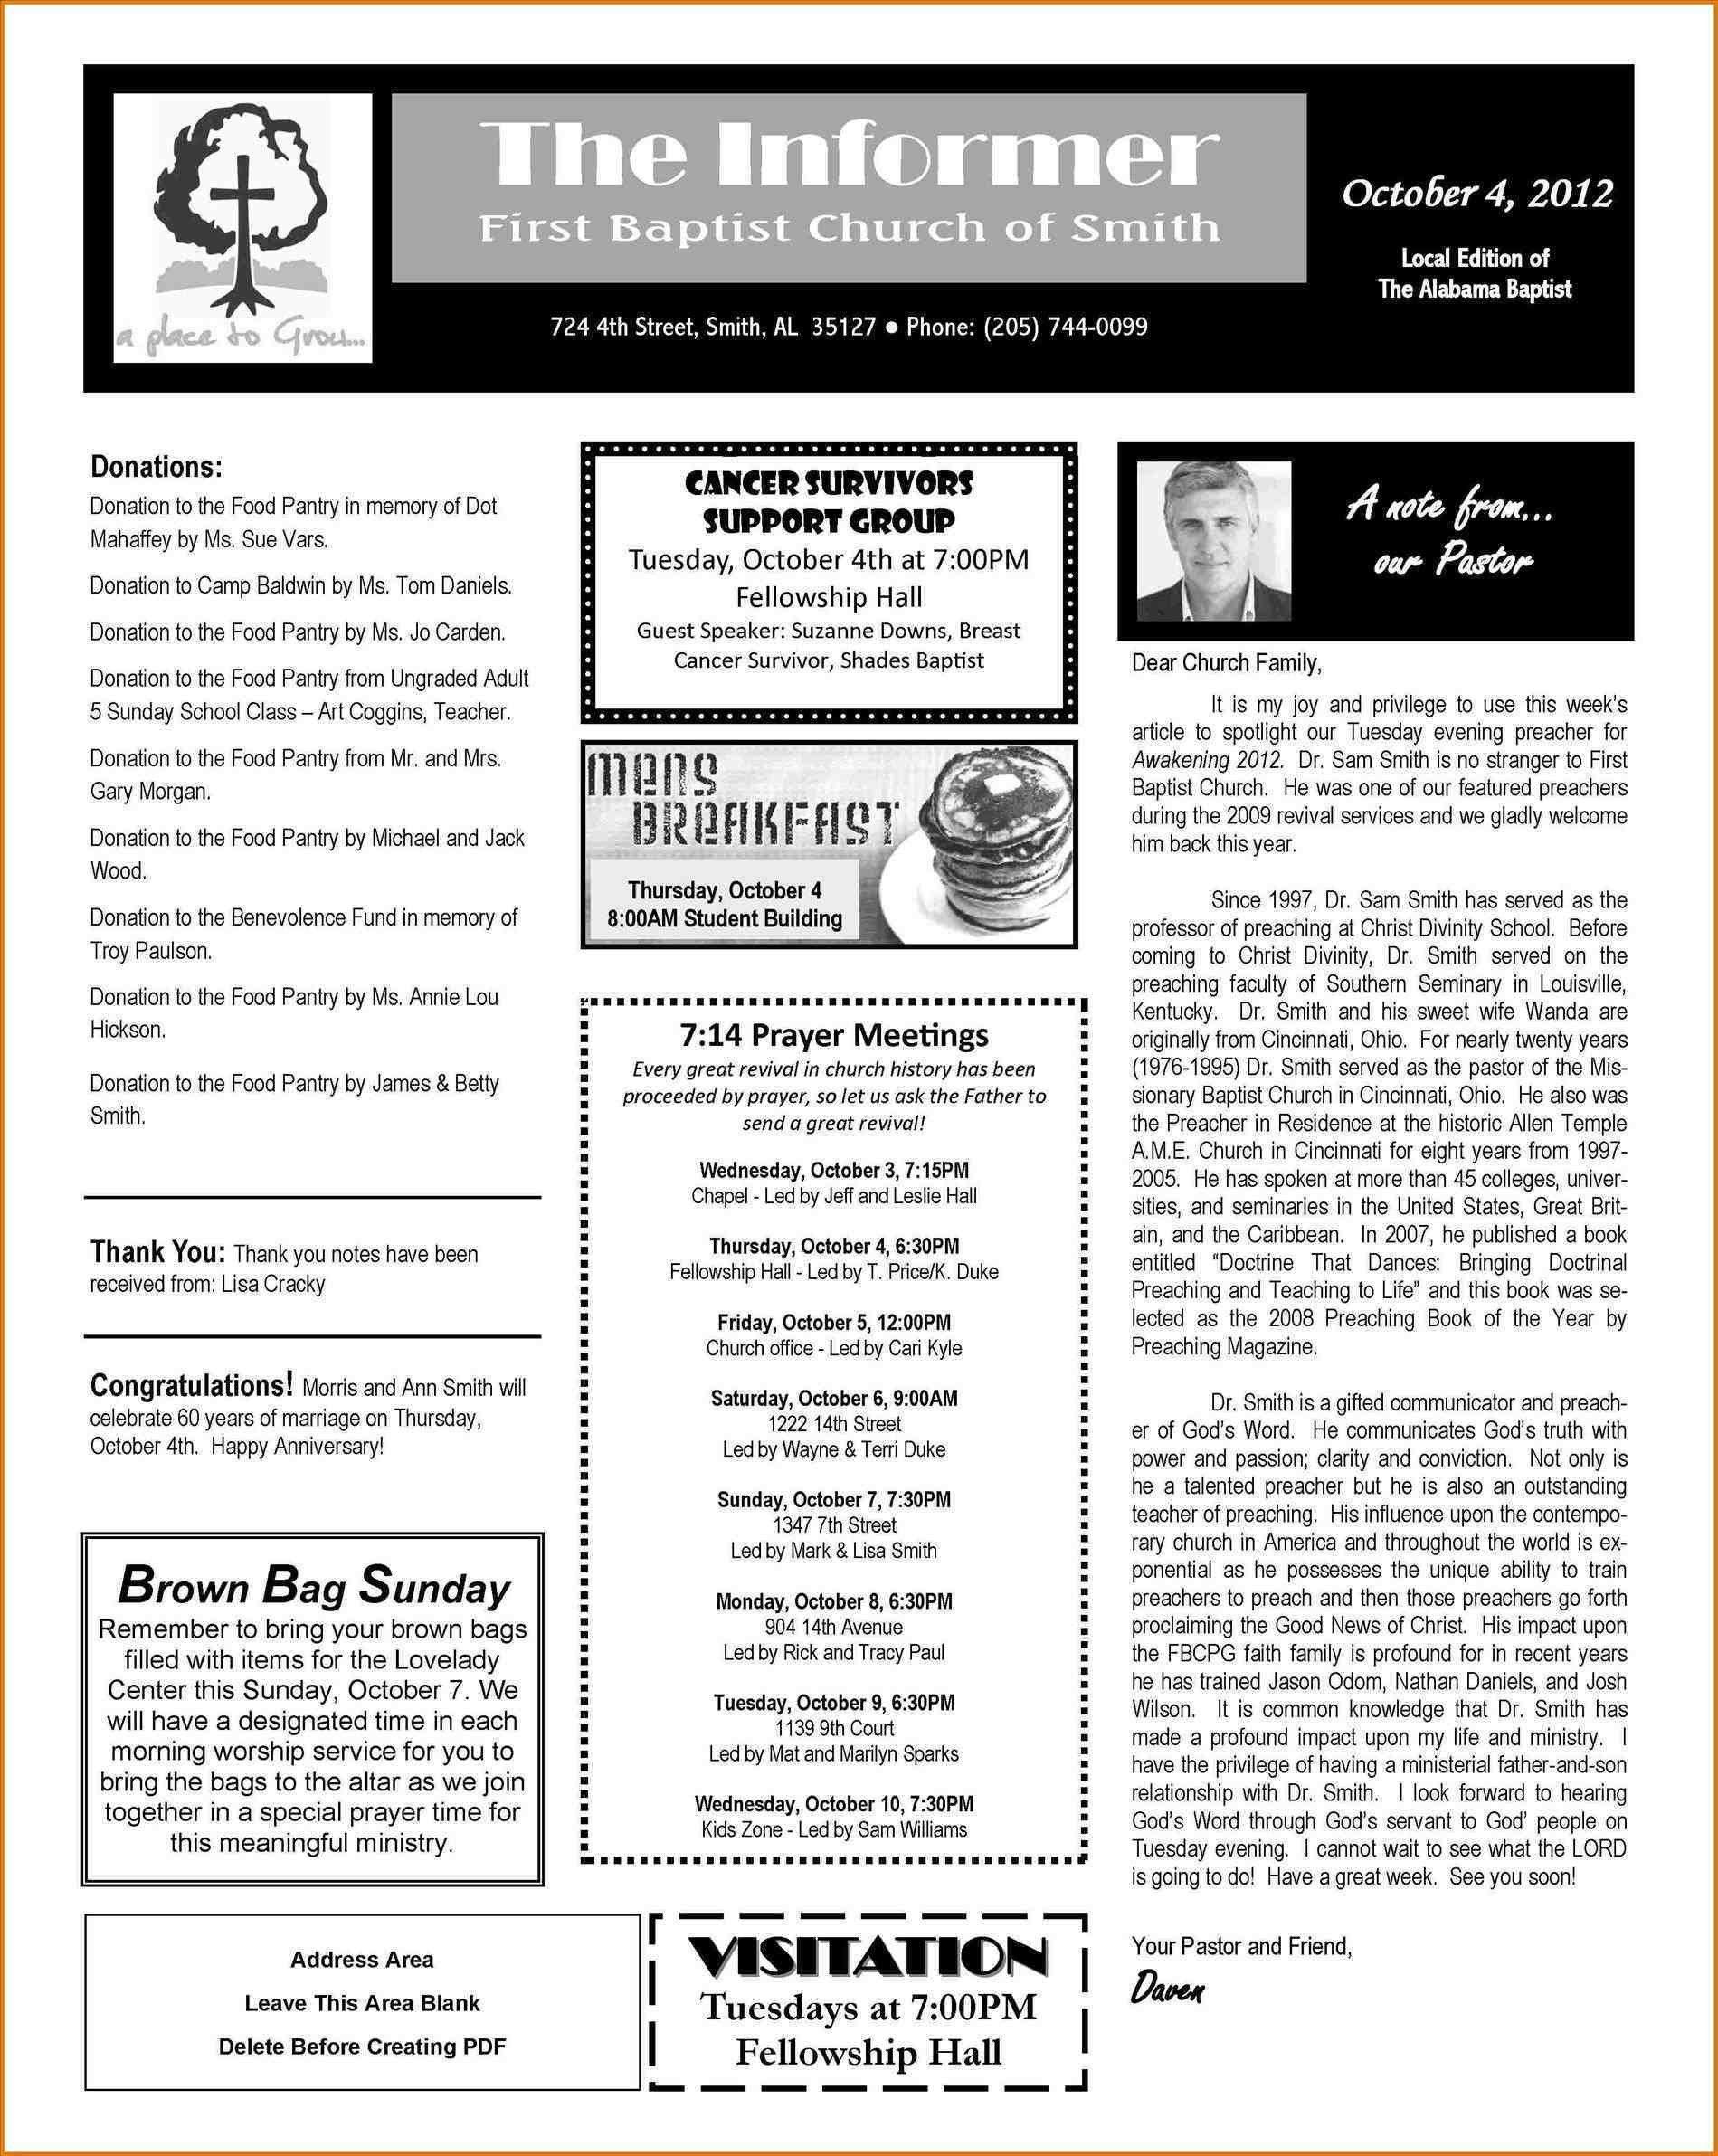 Church Newsletter Format Best Free Church Newsletter Templates For